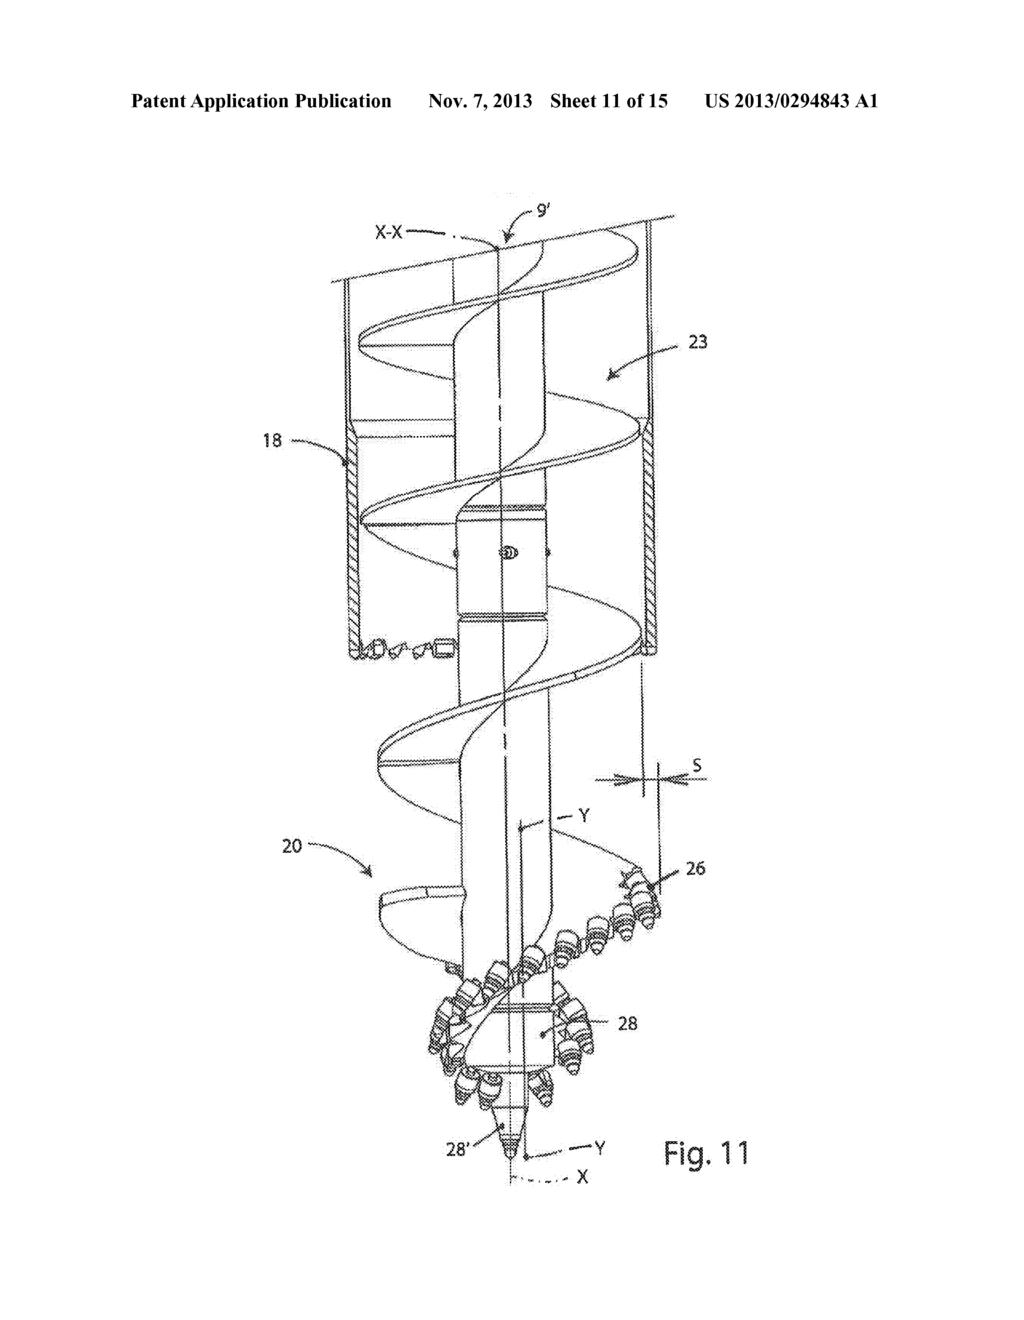 Mag Drill Wiring Diagram Air Compressor Wiring Diagram